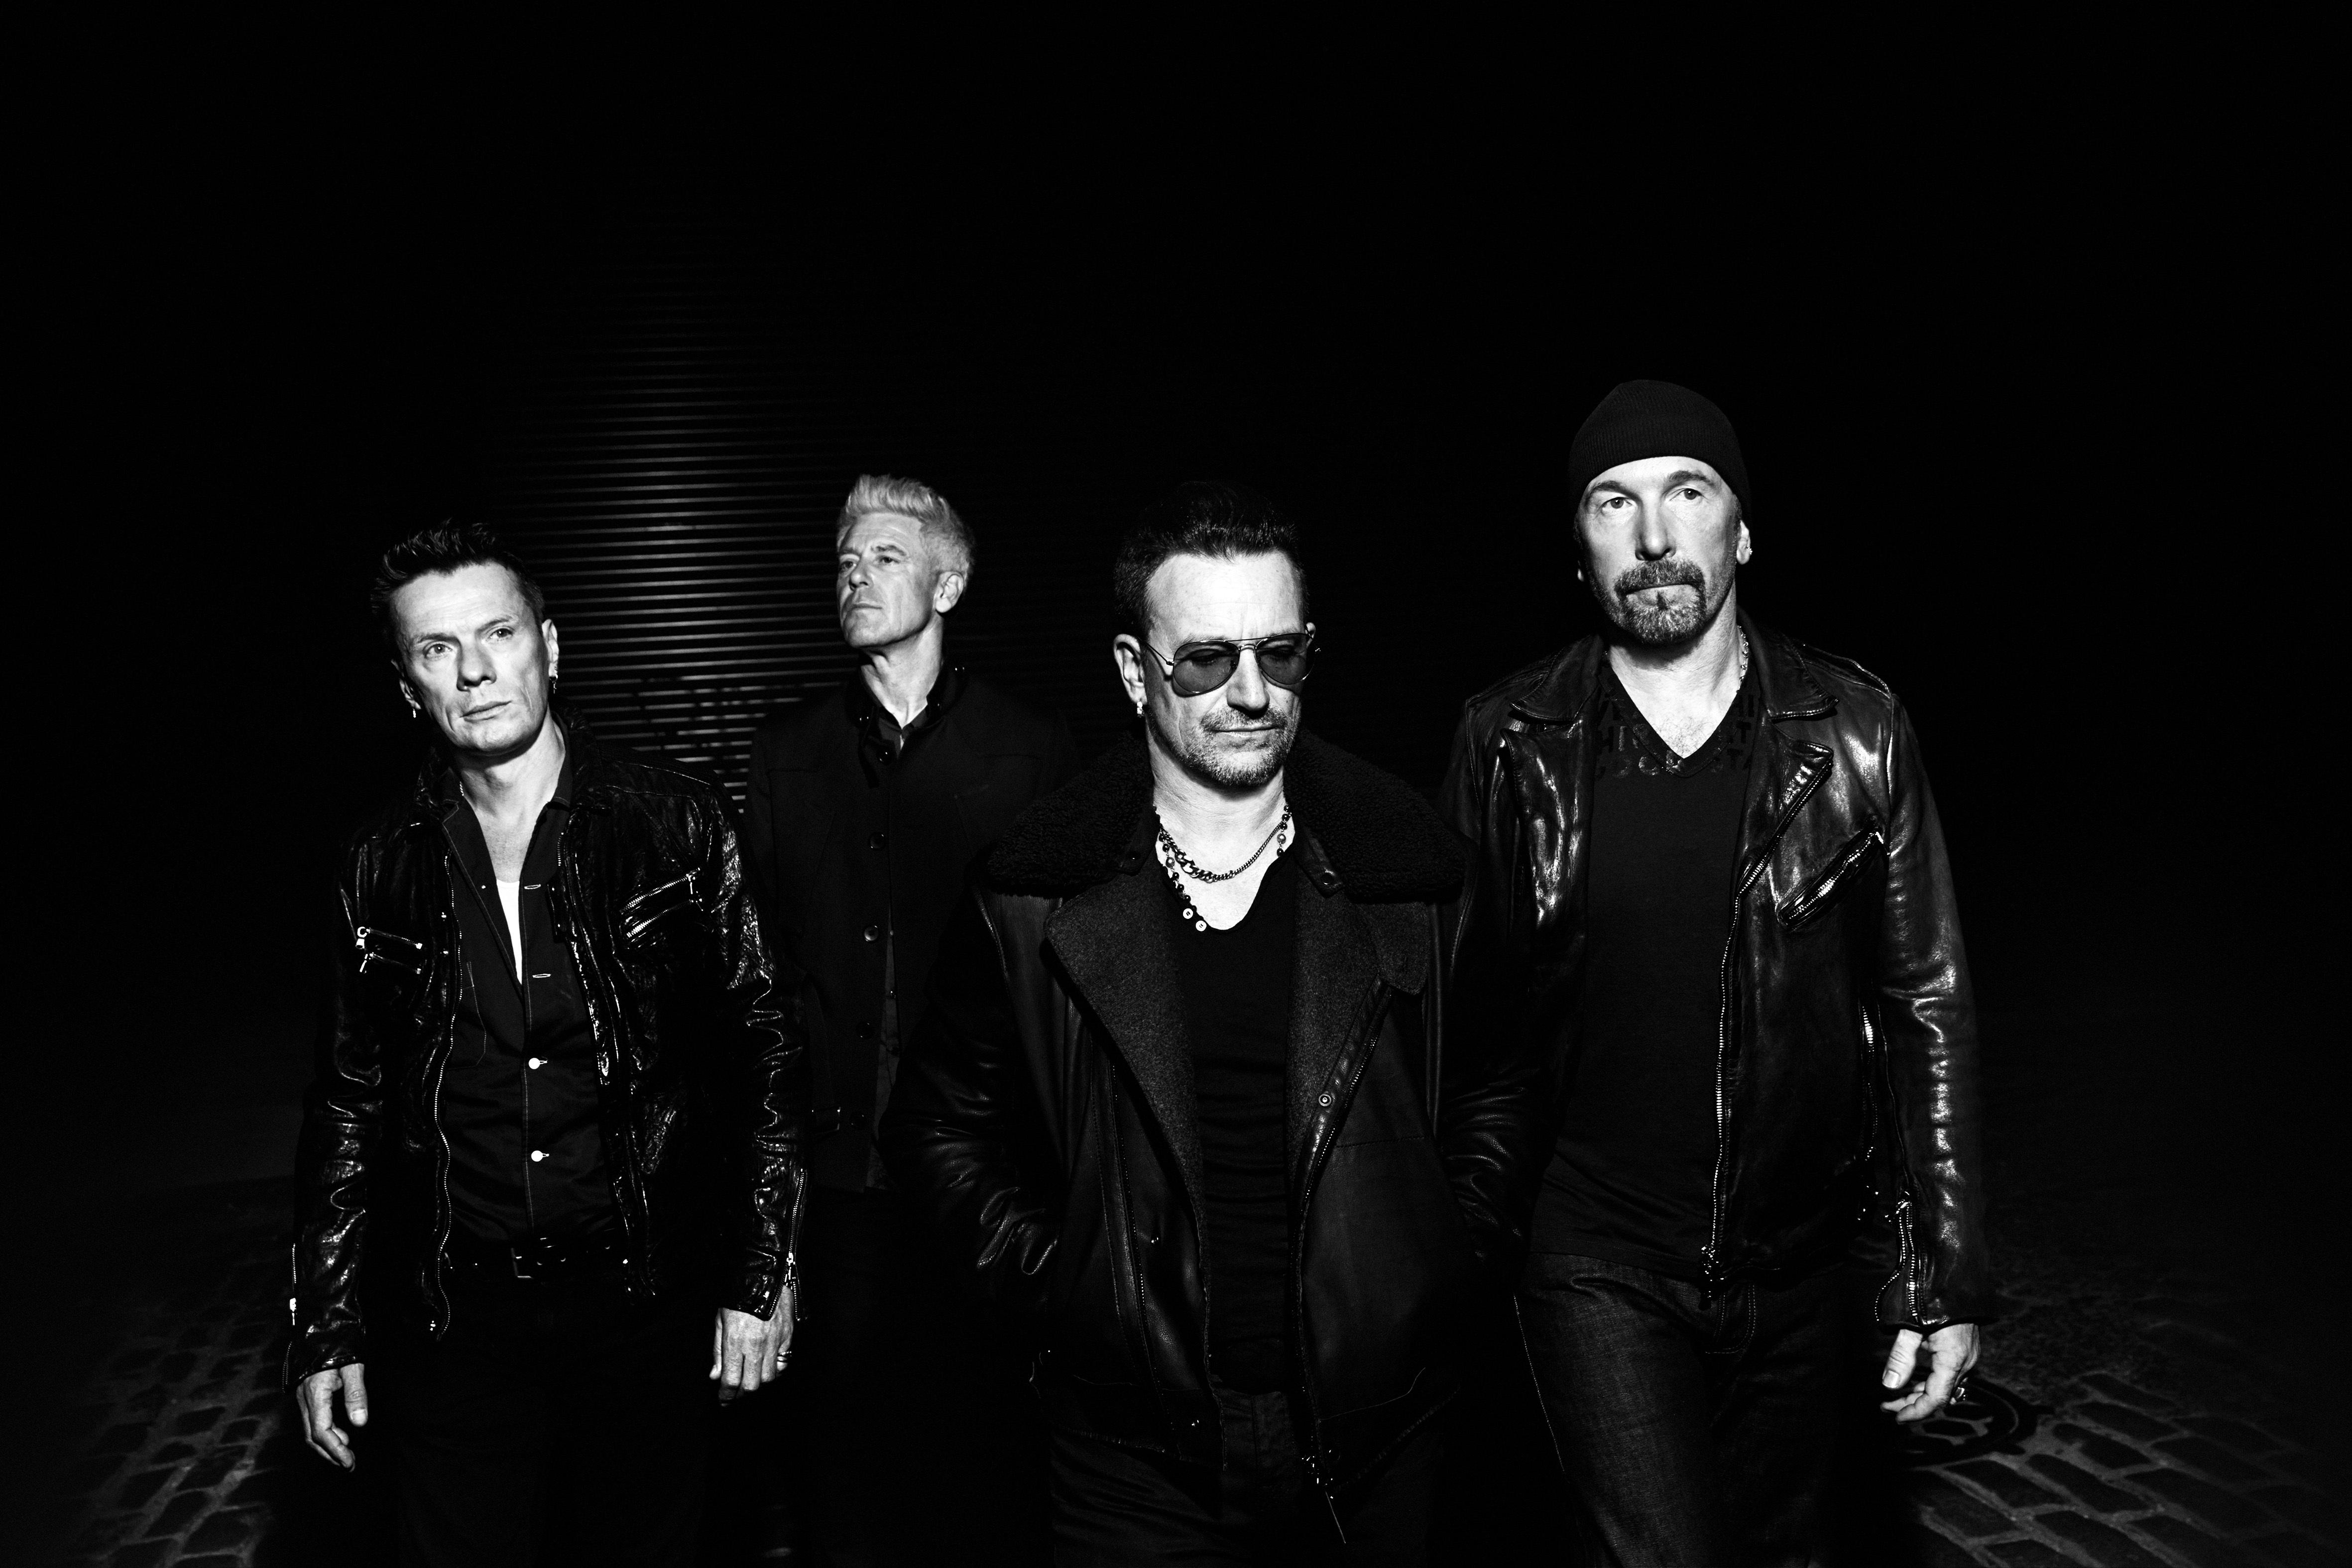 U2 To Receive 2016 iHeartRadio Innovator Award at the iHeartRadio ...